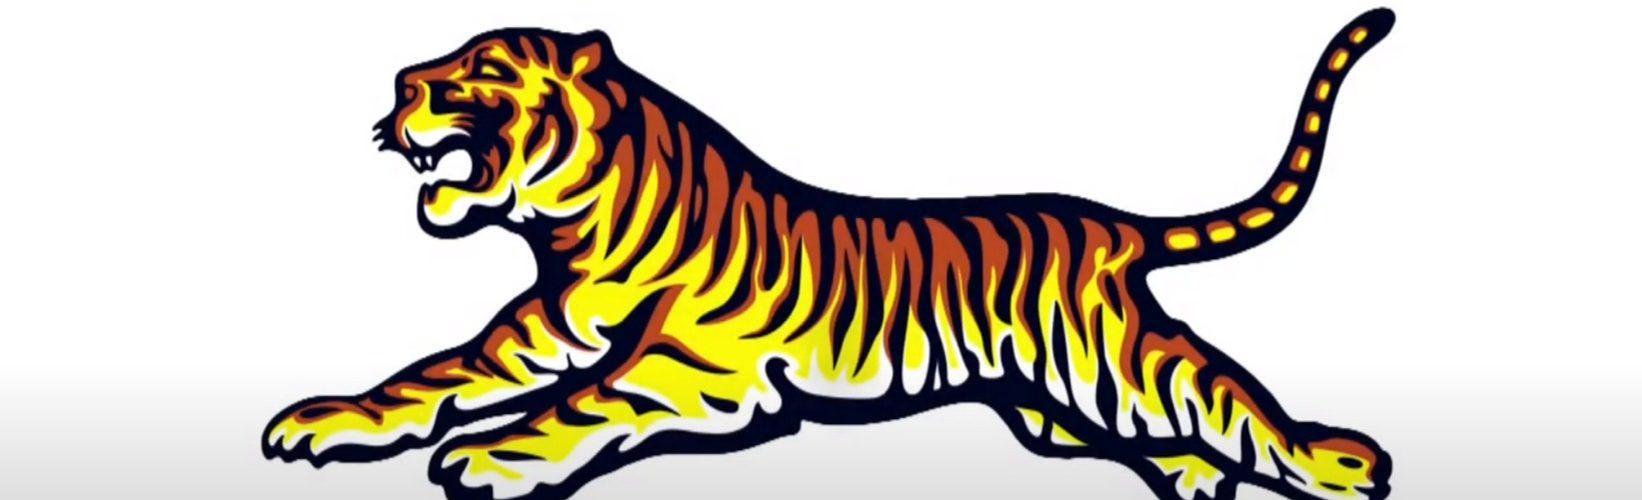 Baume du tigre Thaïlande bienfaits Tiger Balm